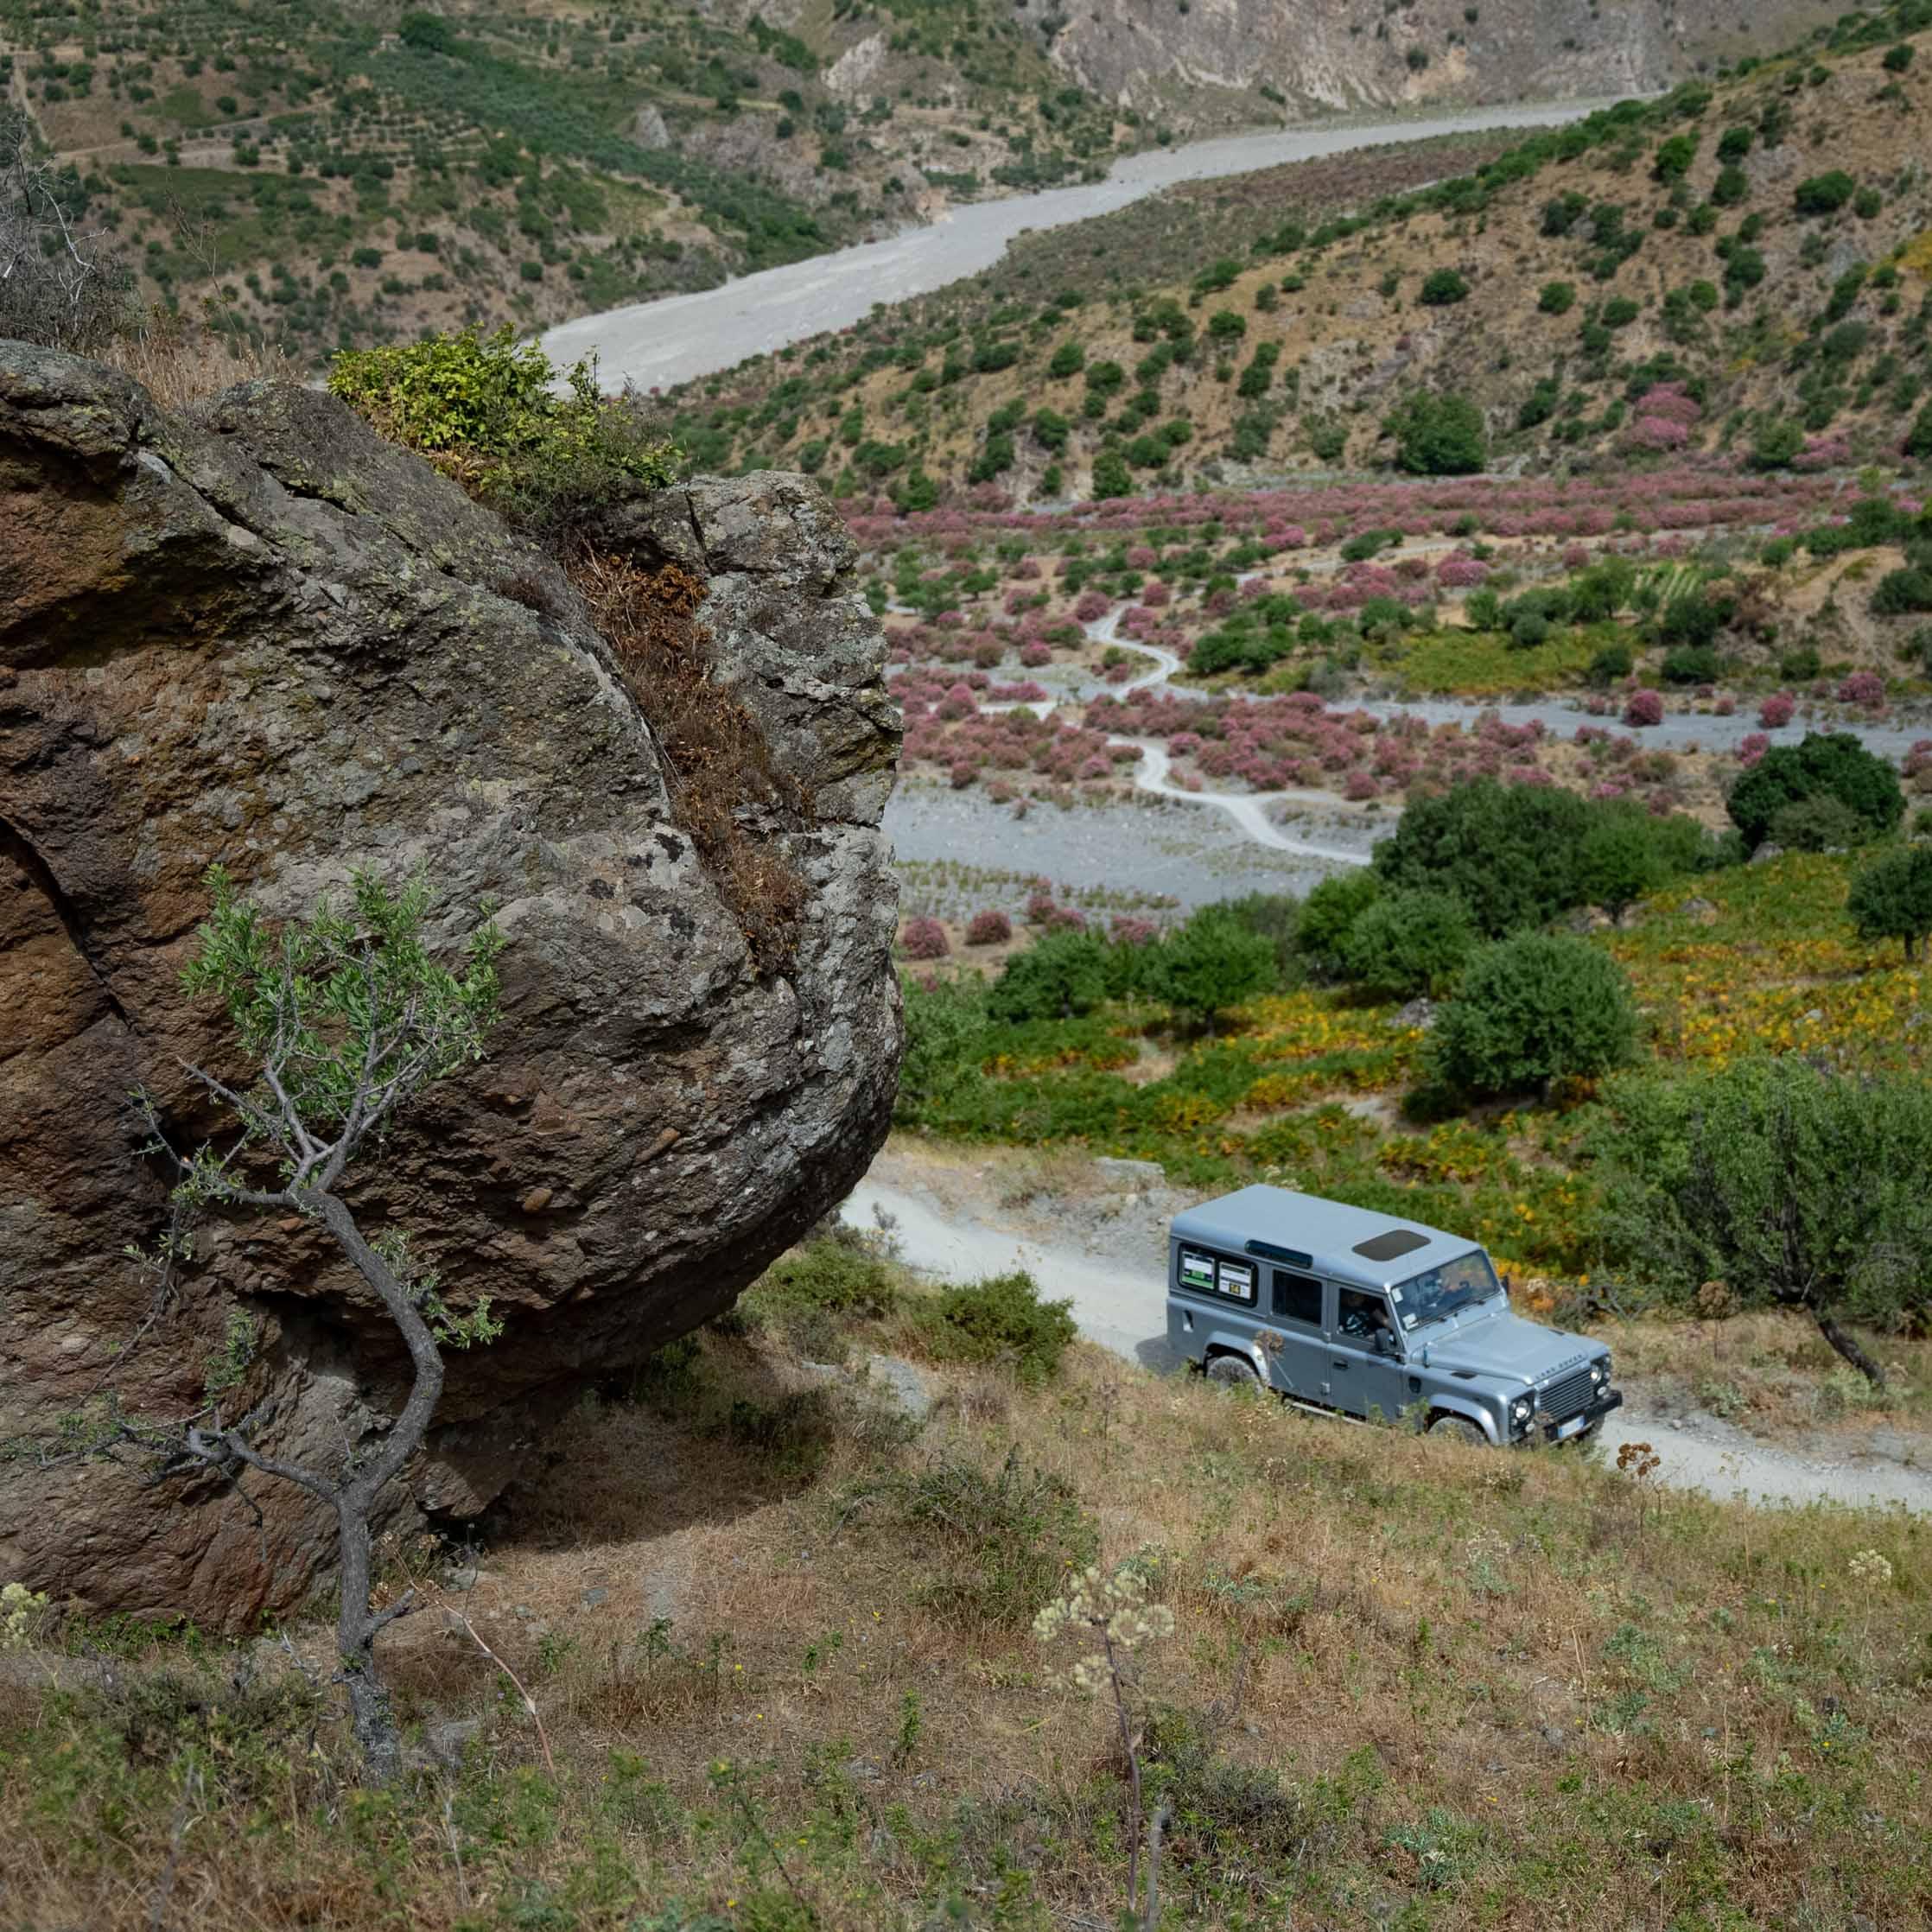 Land_Rover_Tour_Sicilia_2021_Land_Rover_Experience_Italia_-12